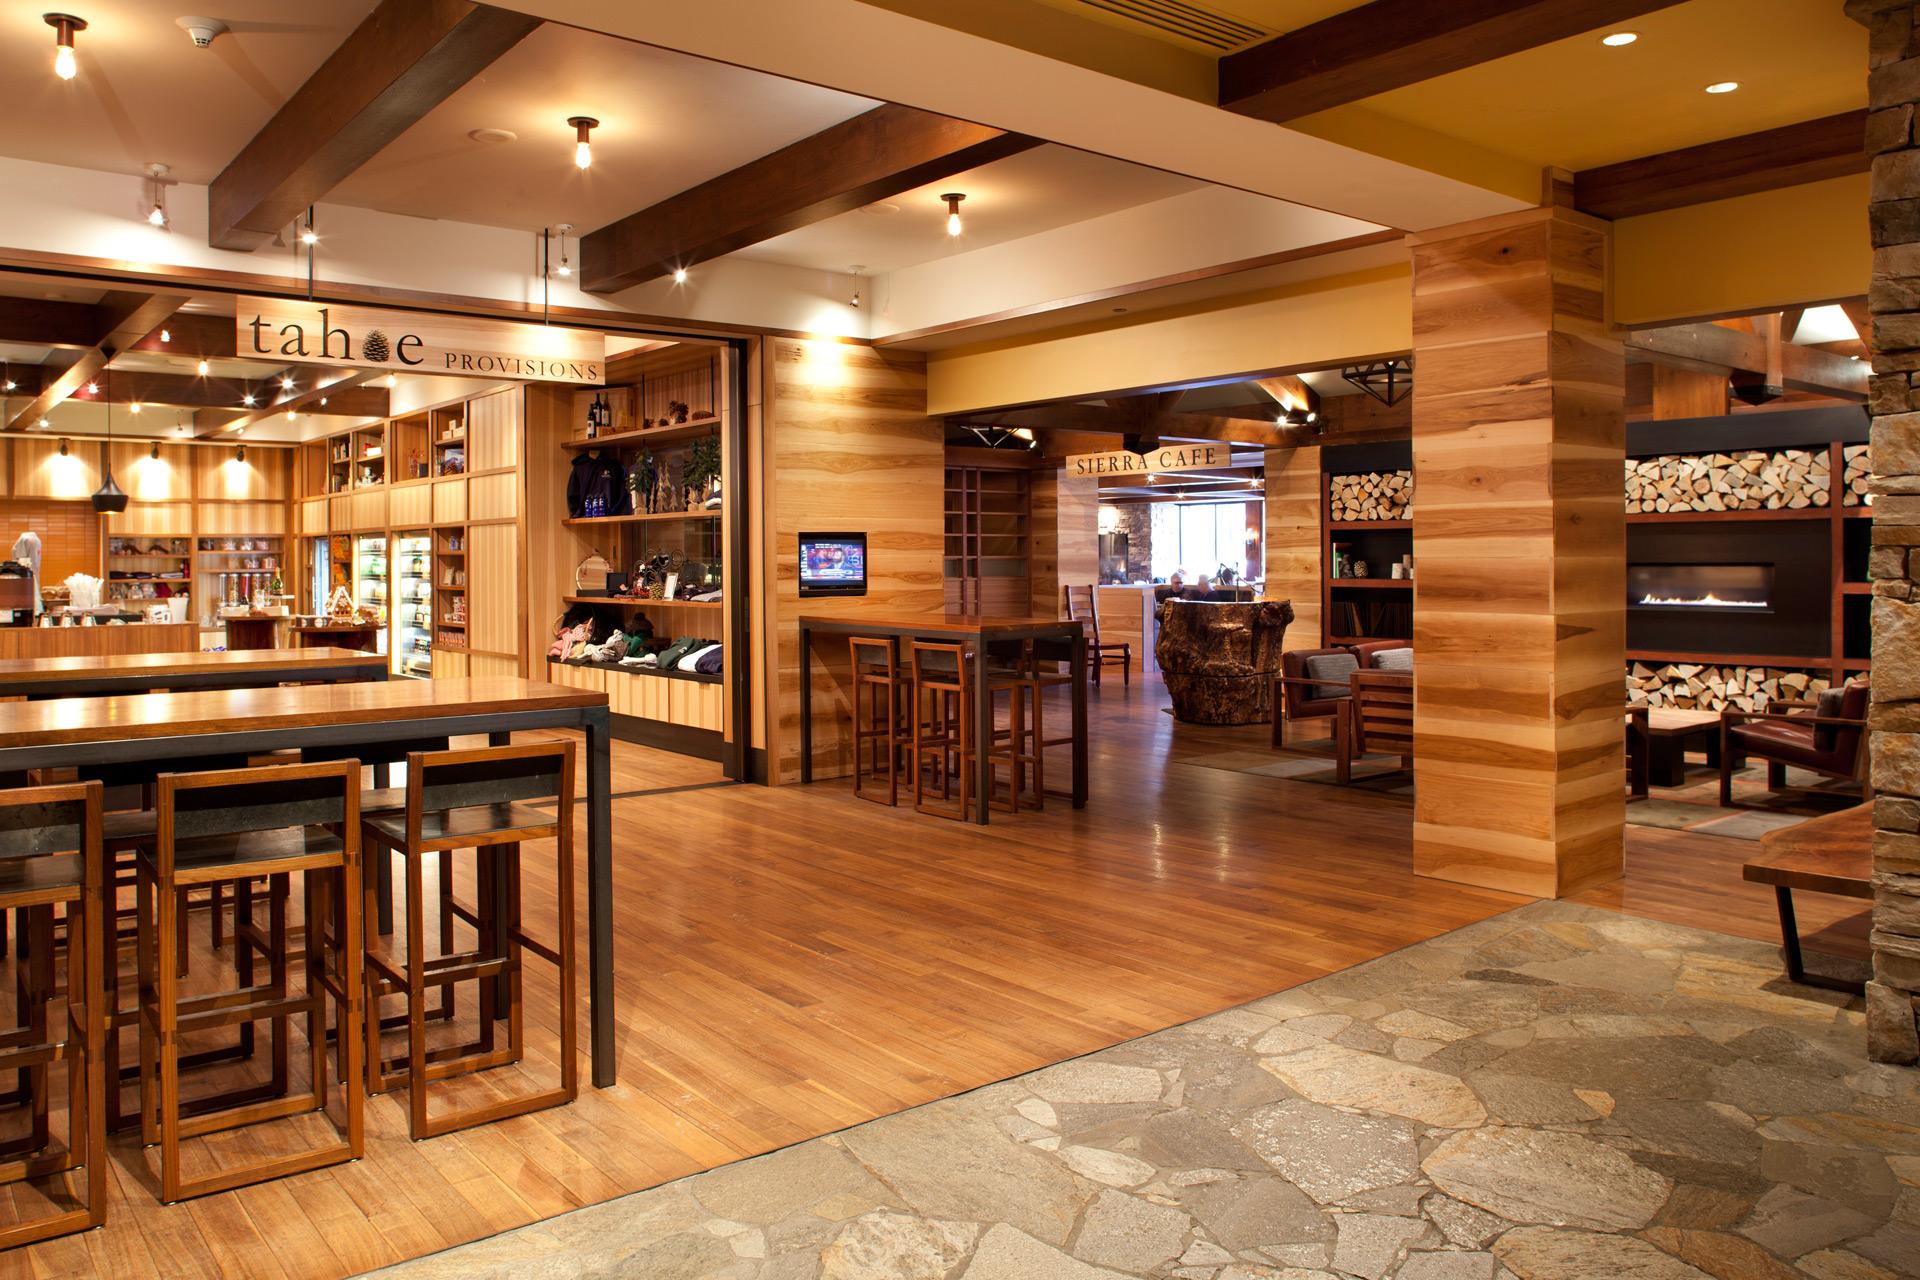 Sierra Café restaurant home decor ideas